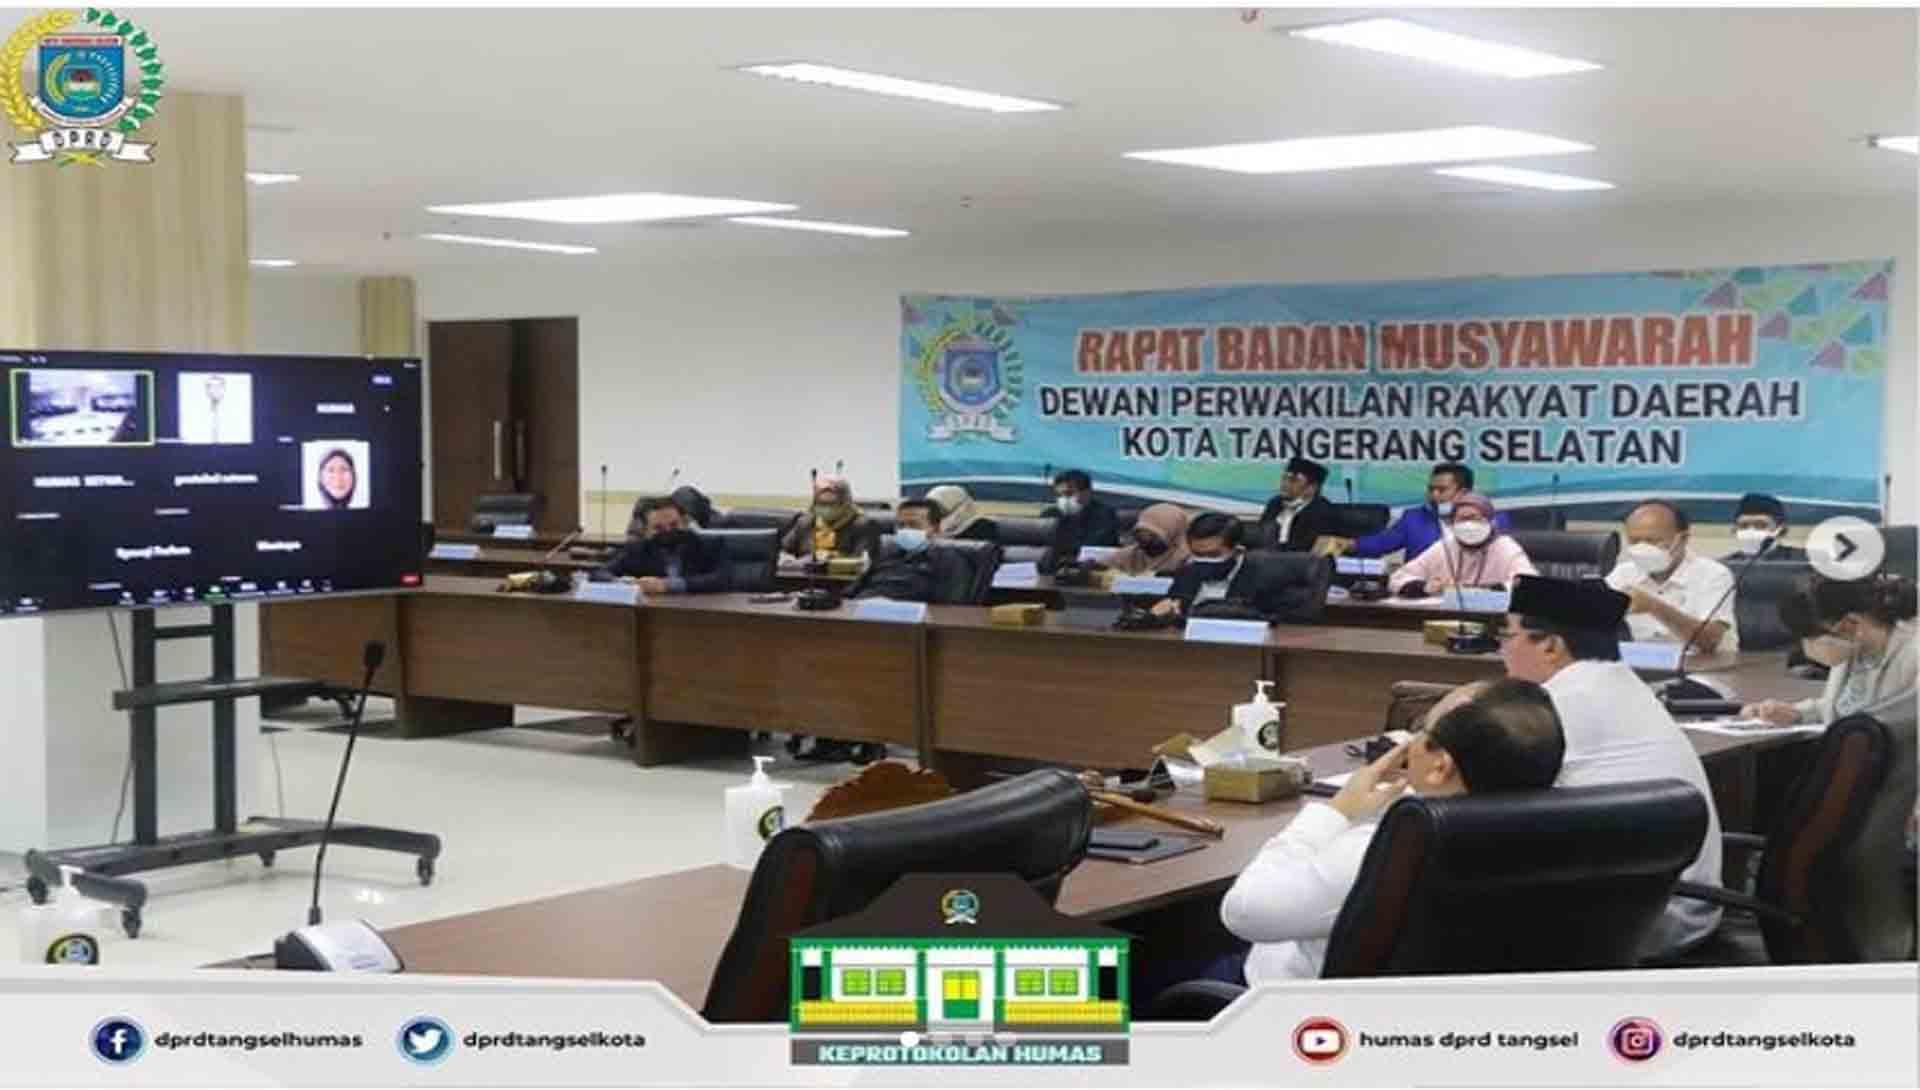 Rapat Badan Musyawarah Penyampaian KUPA PPAS Perubahan Tahun 2021